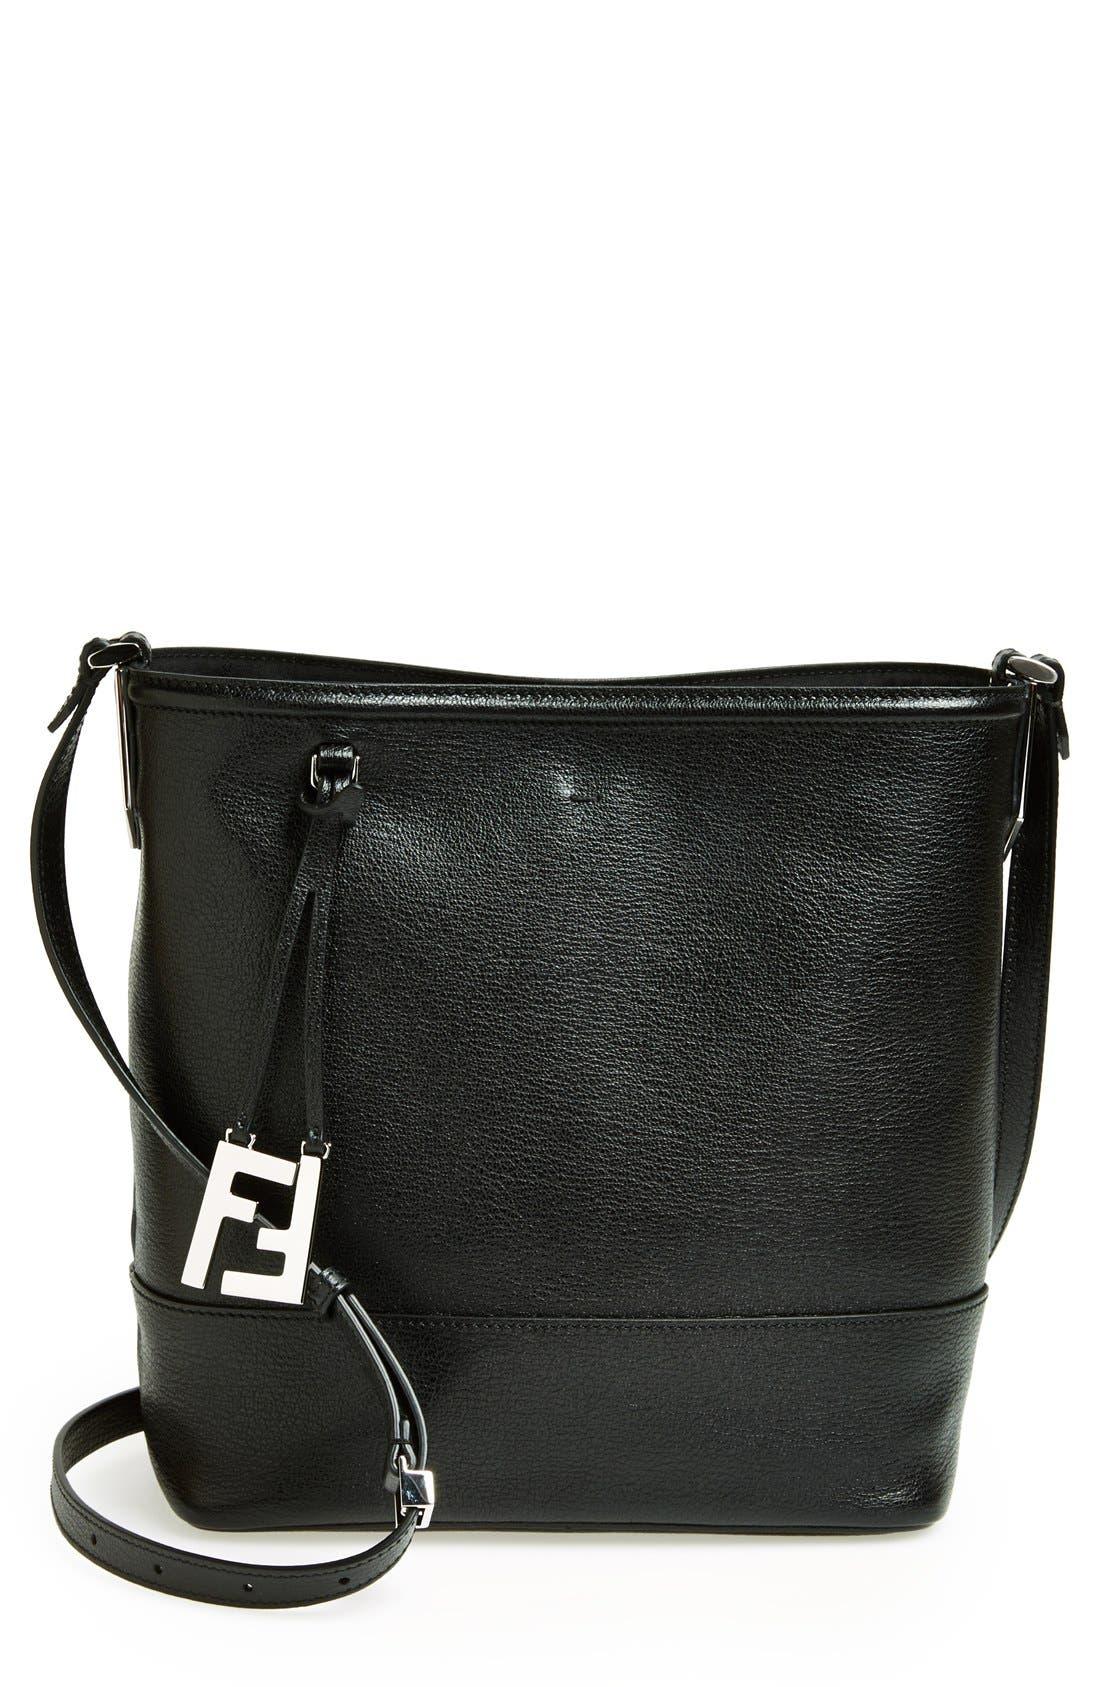 Leather Bucket Crossbody Bag,                             Main thumbnail 1, color,                             Black/ Palladium